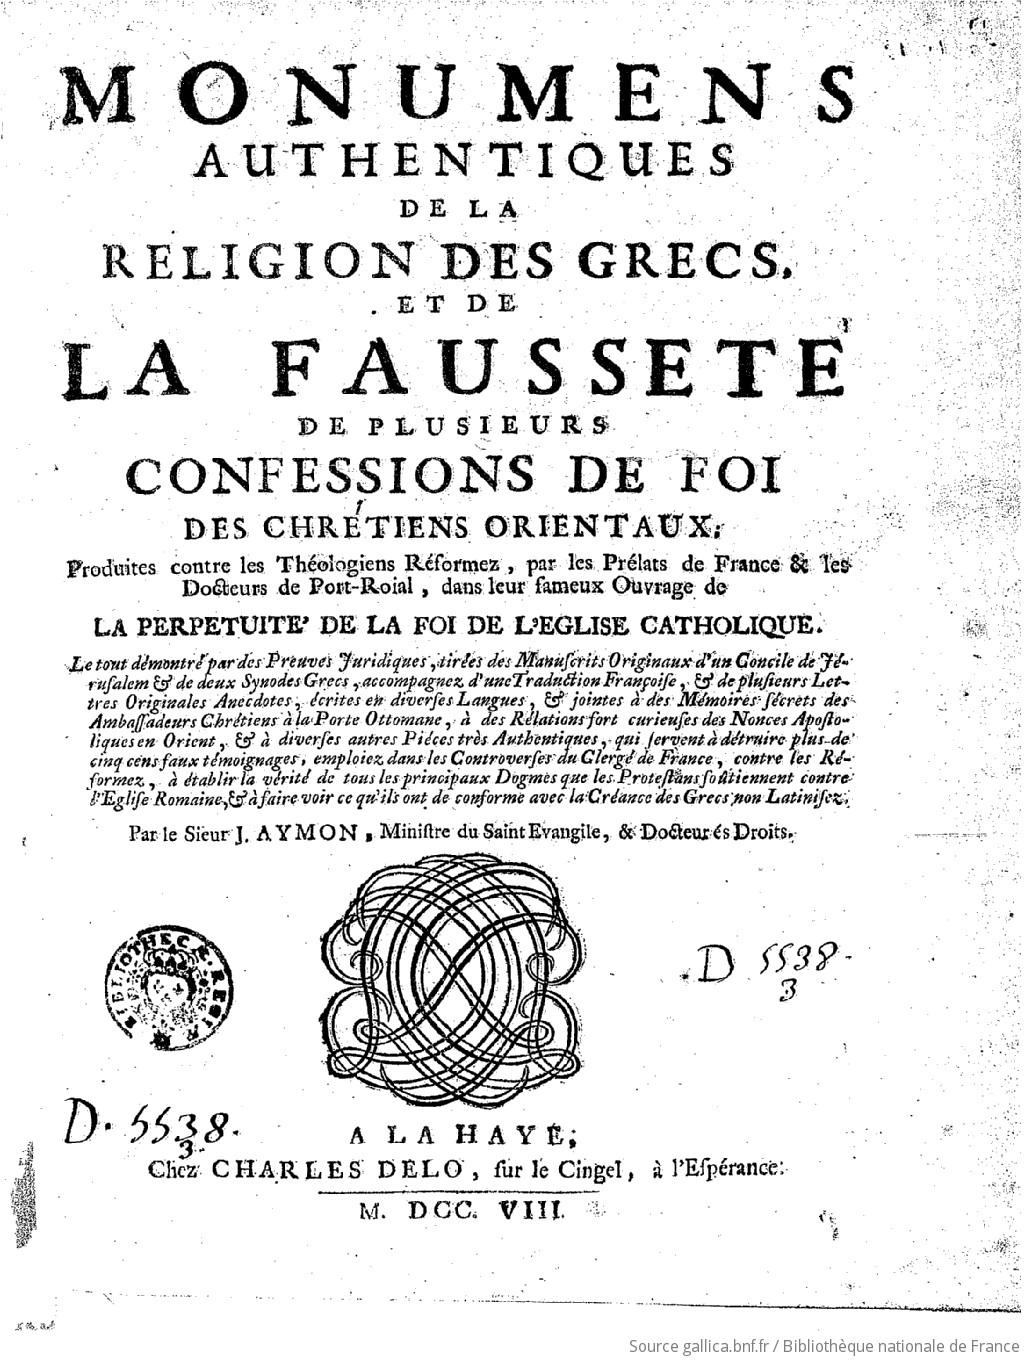 http://gallica.bnf.fr/ark:/12148/bpt6k56086749/f5.highres